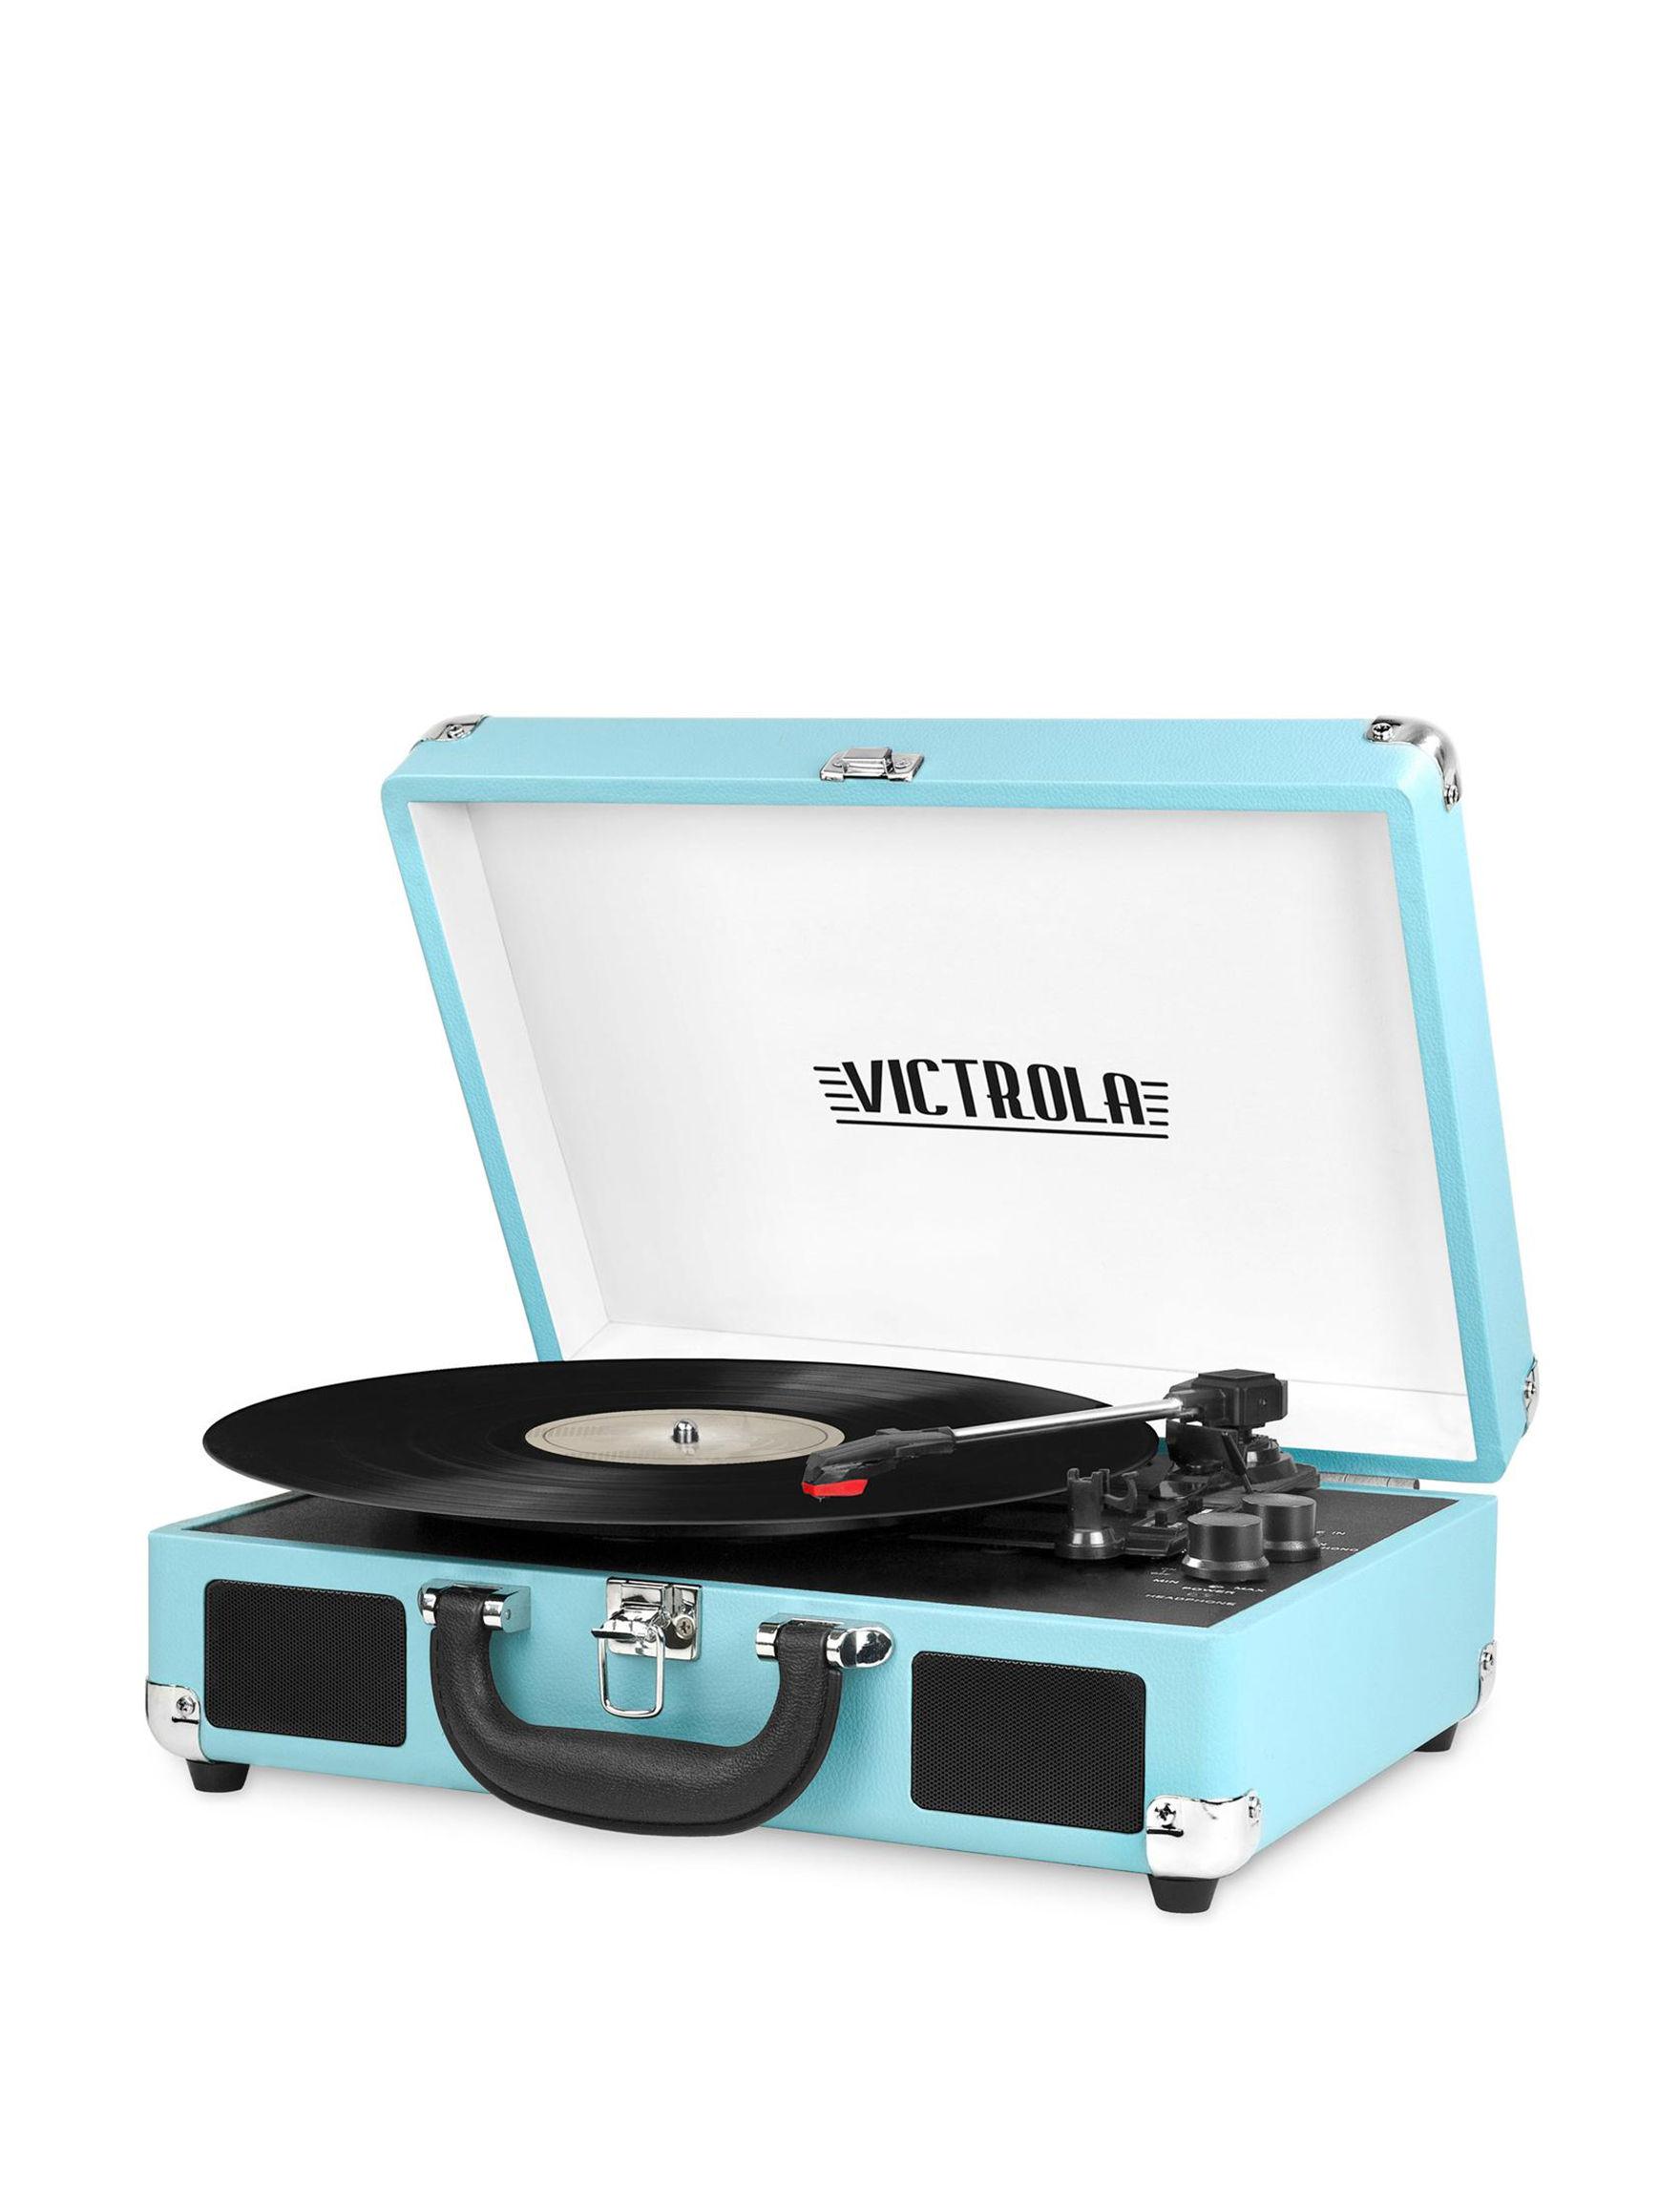 Victrola Turqouise Speakers & Docks Home & Portable Audio